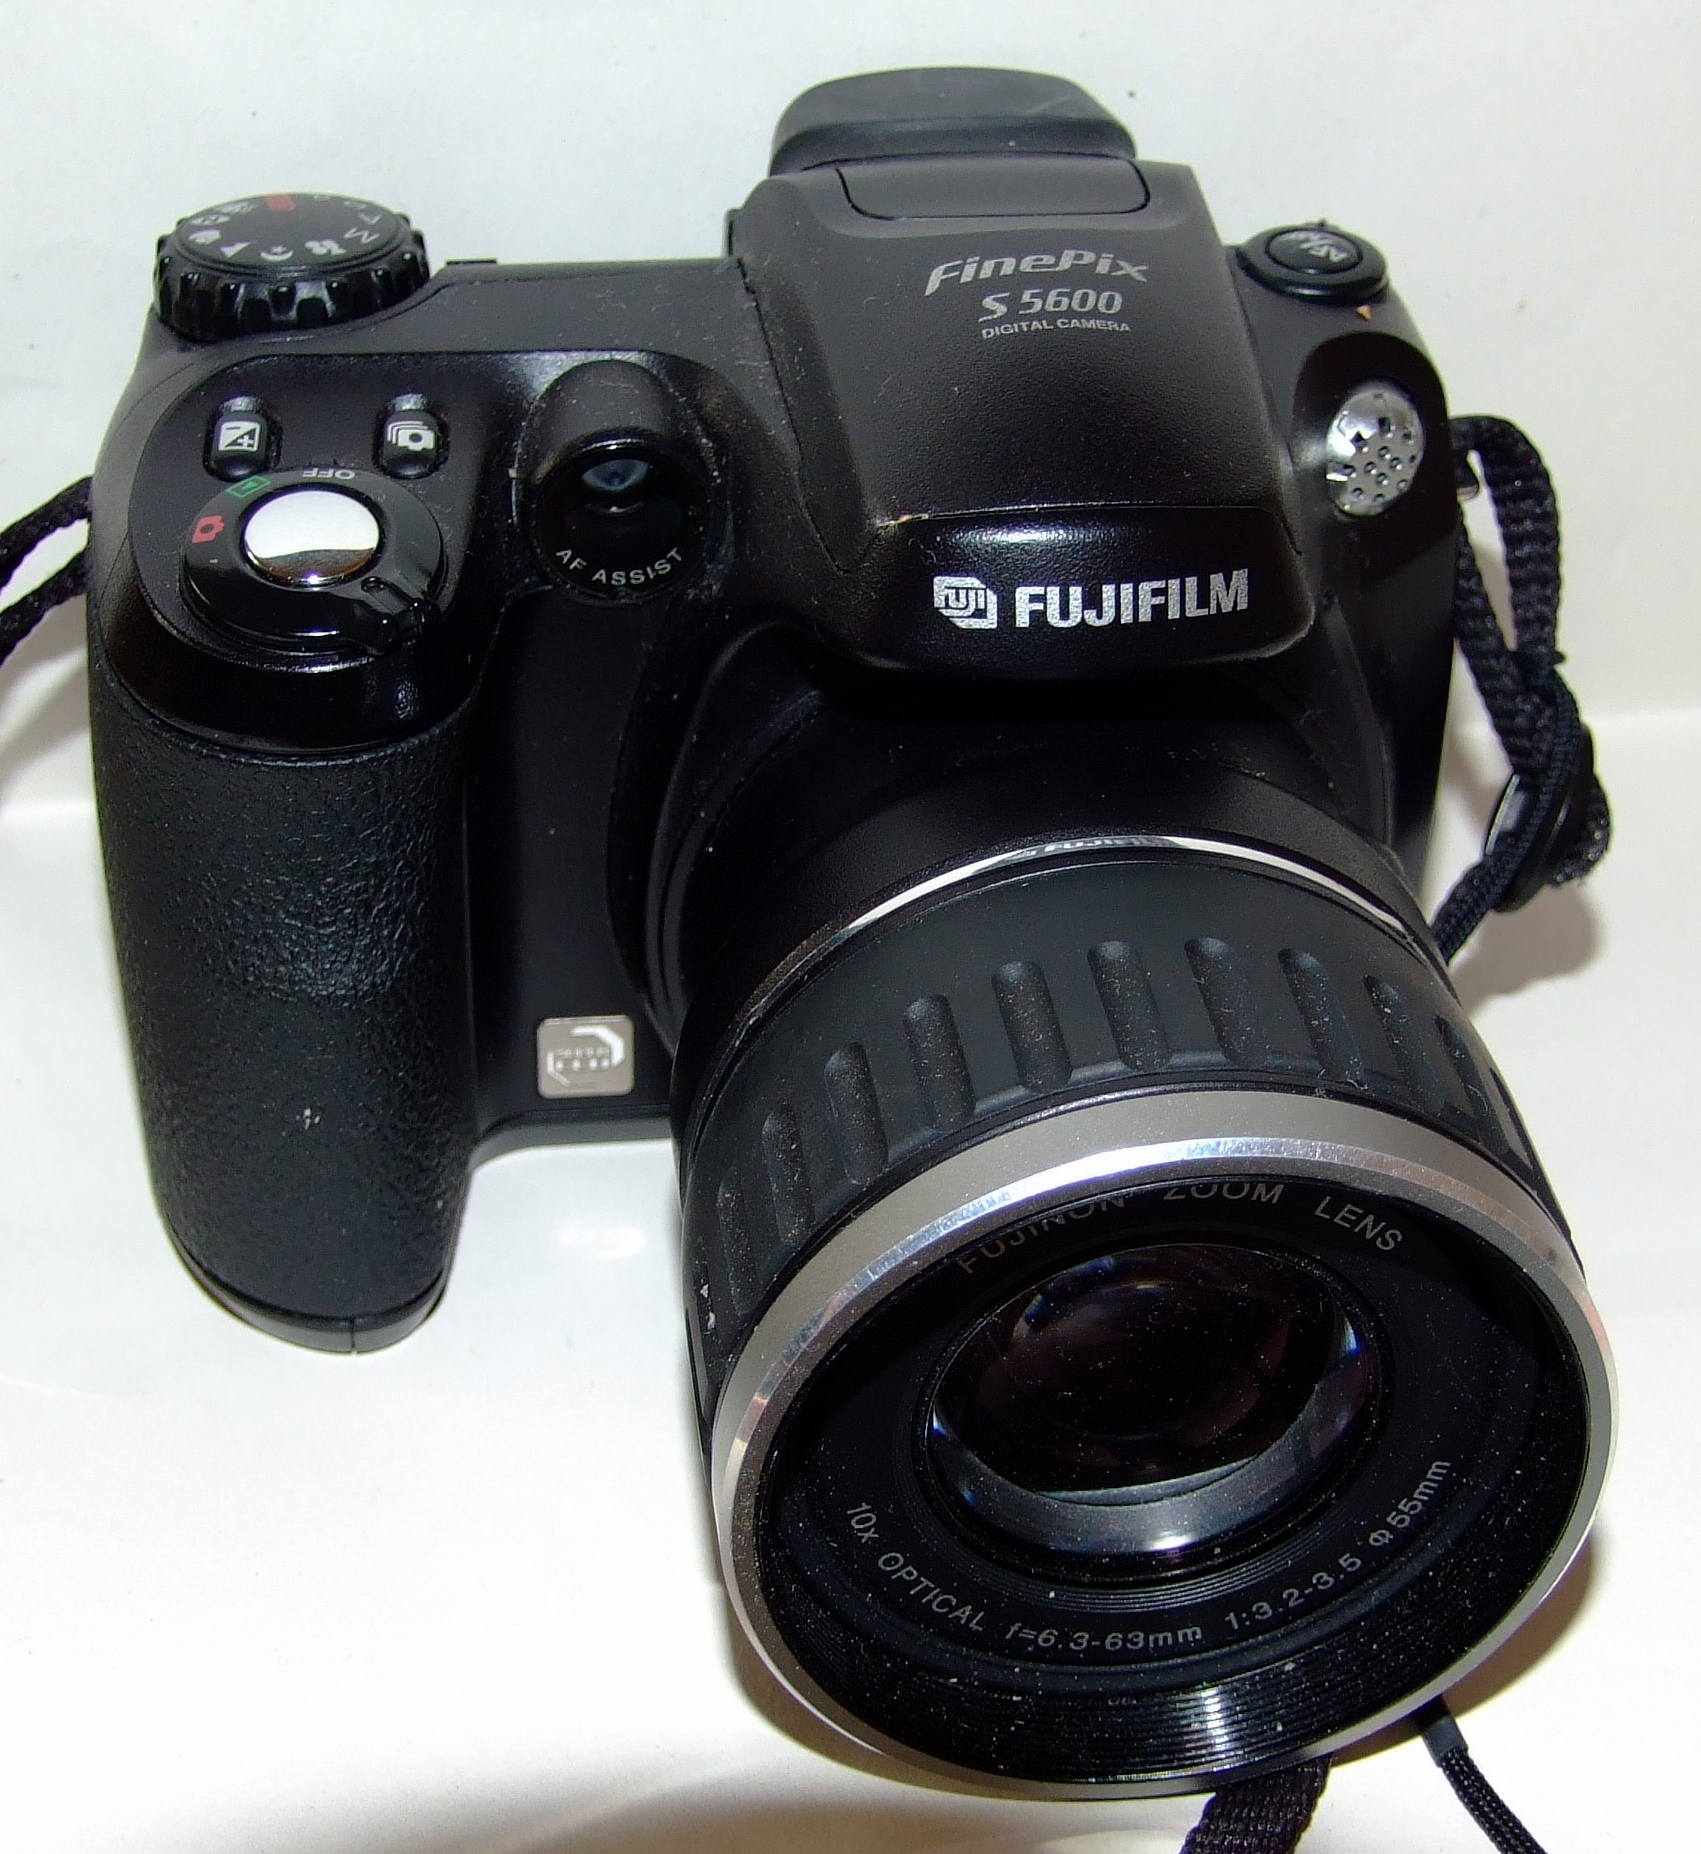 File:Fujifilm FinePix S5600.jpg